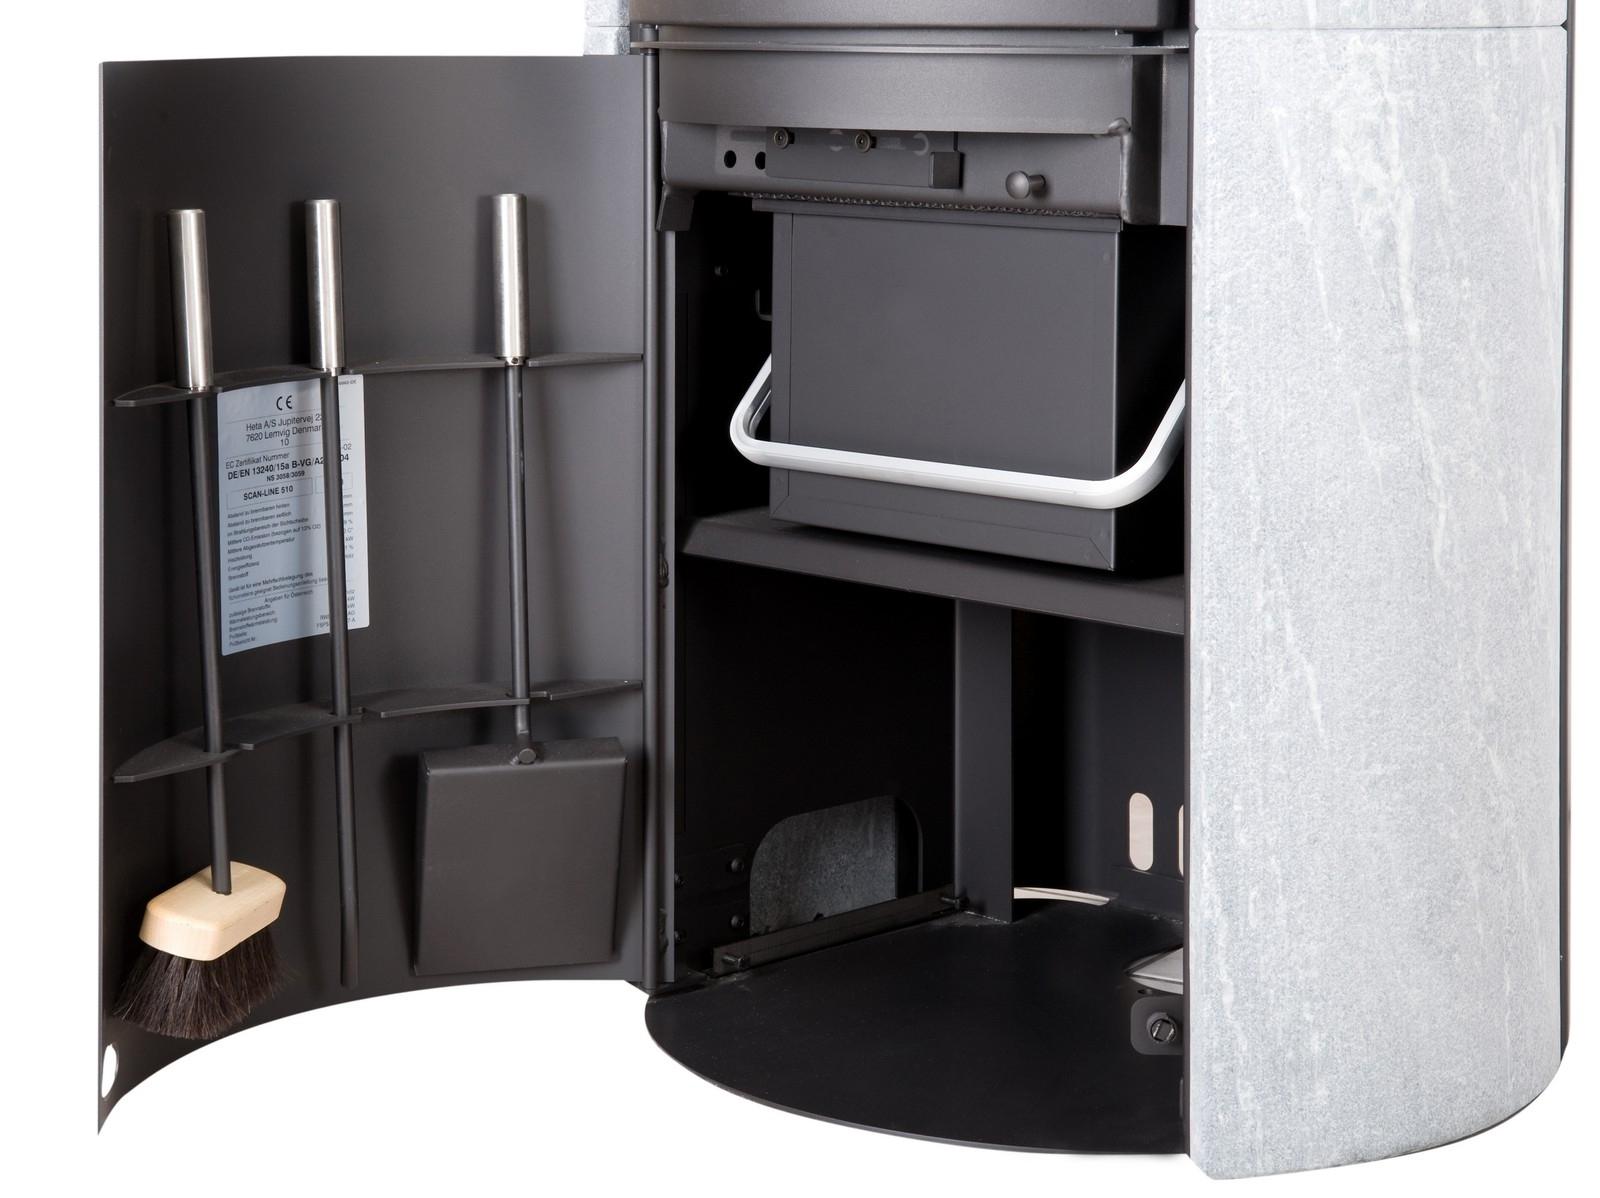 heta sl 820 s vitr r f chauffage po les bois design espace po le scandinave. Black Bedroom Furniture Sets. Home Design Ideas